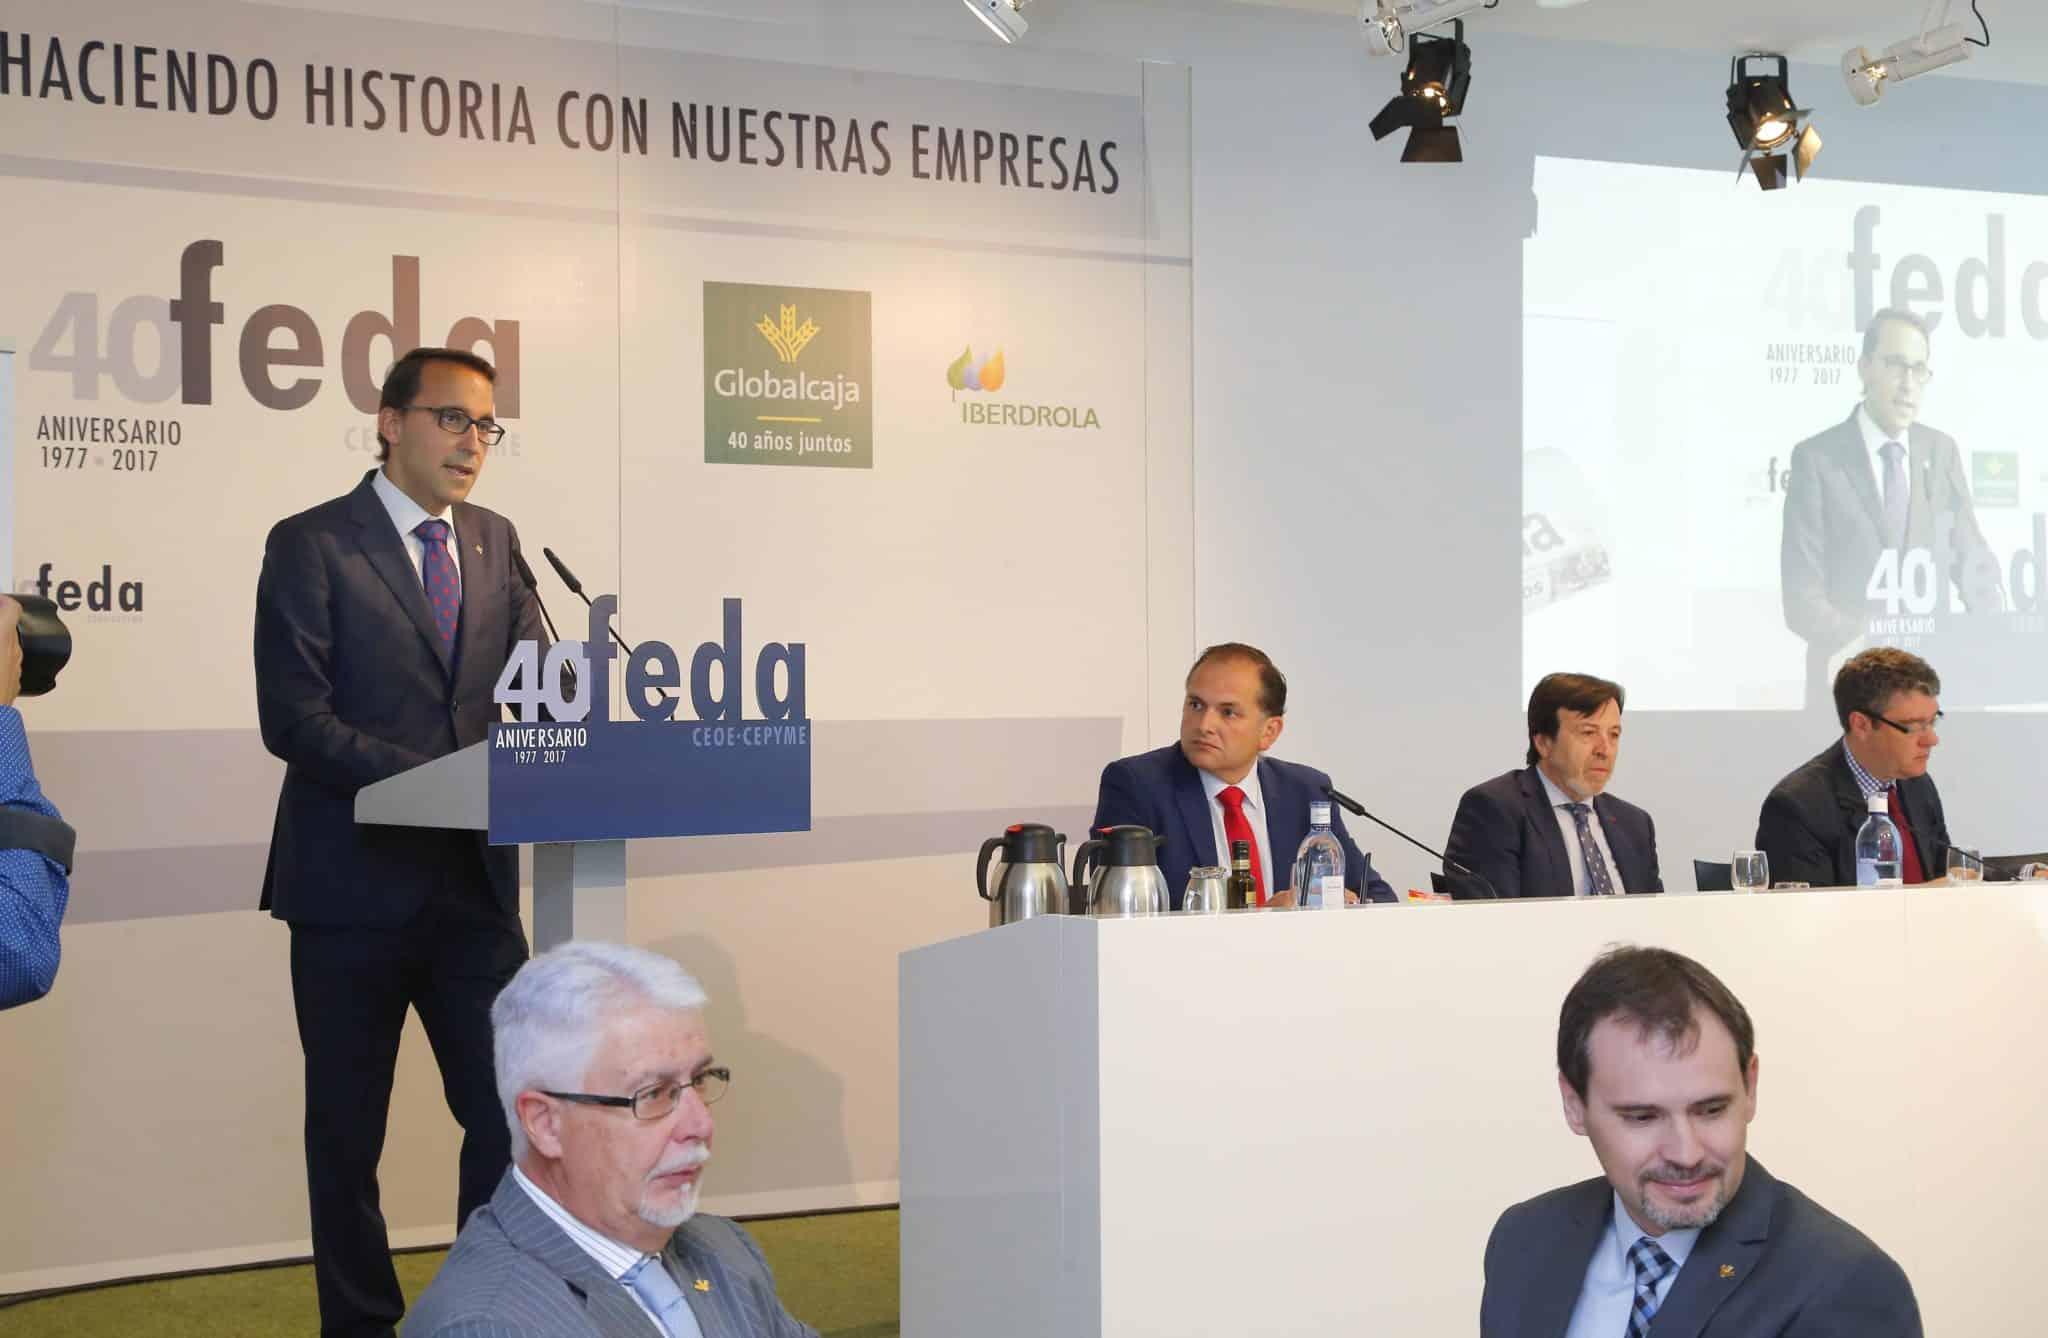 https://blog.globalcaja.es/wp-content/uploads/2017/05/Alvaro-nadal-ministro-feda-desayuno-albacete-28.jpgAlvaro-nadal-ministro-feda-desayuno-albacete-28.jpg